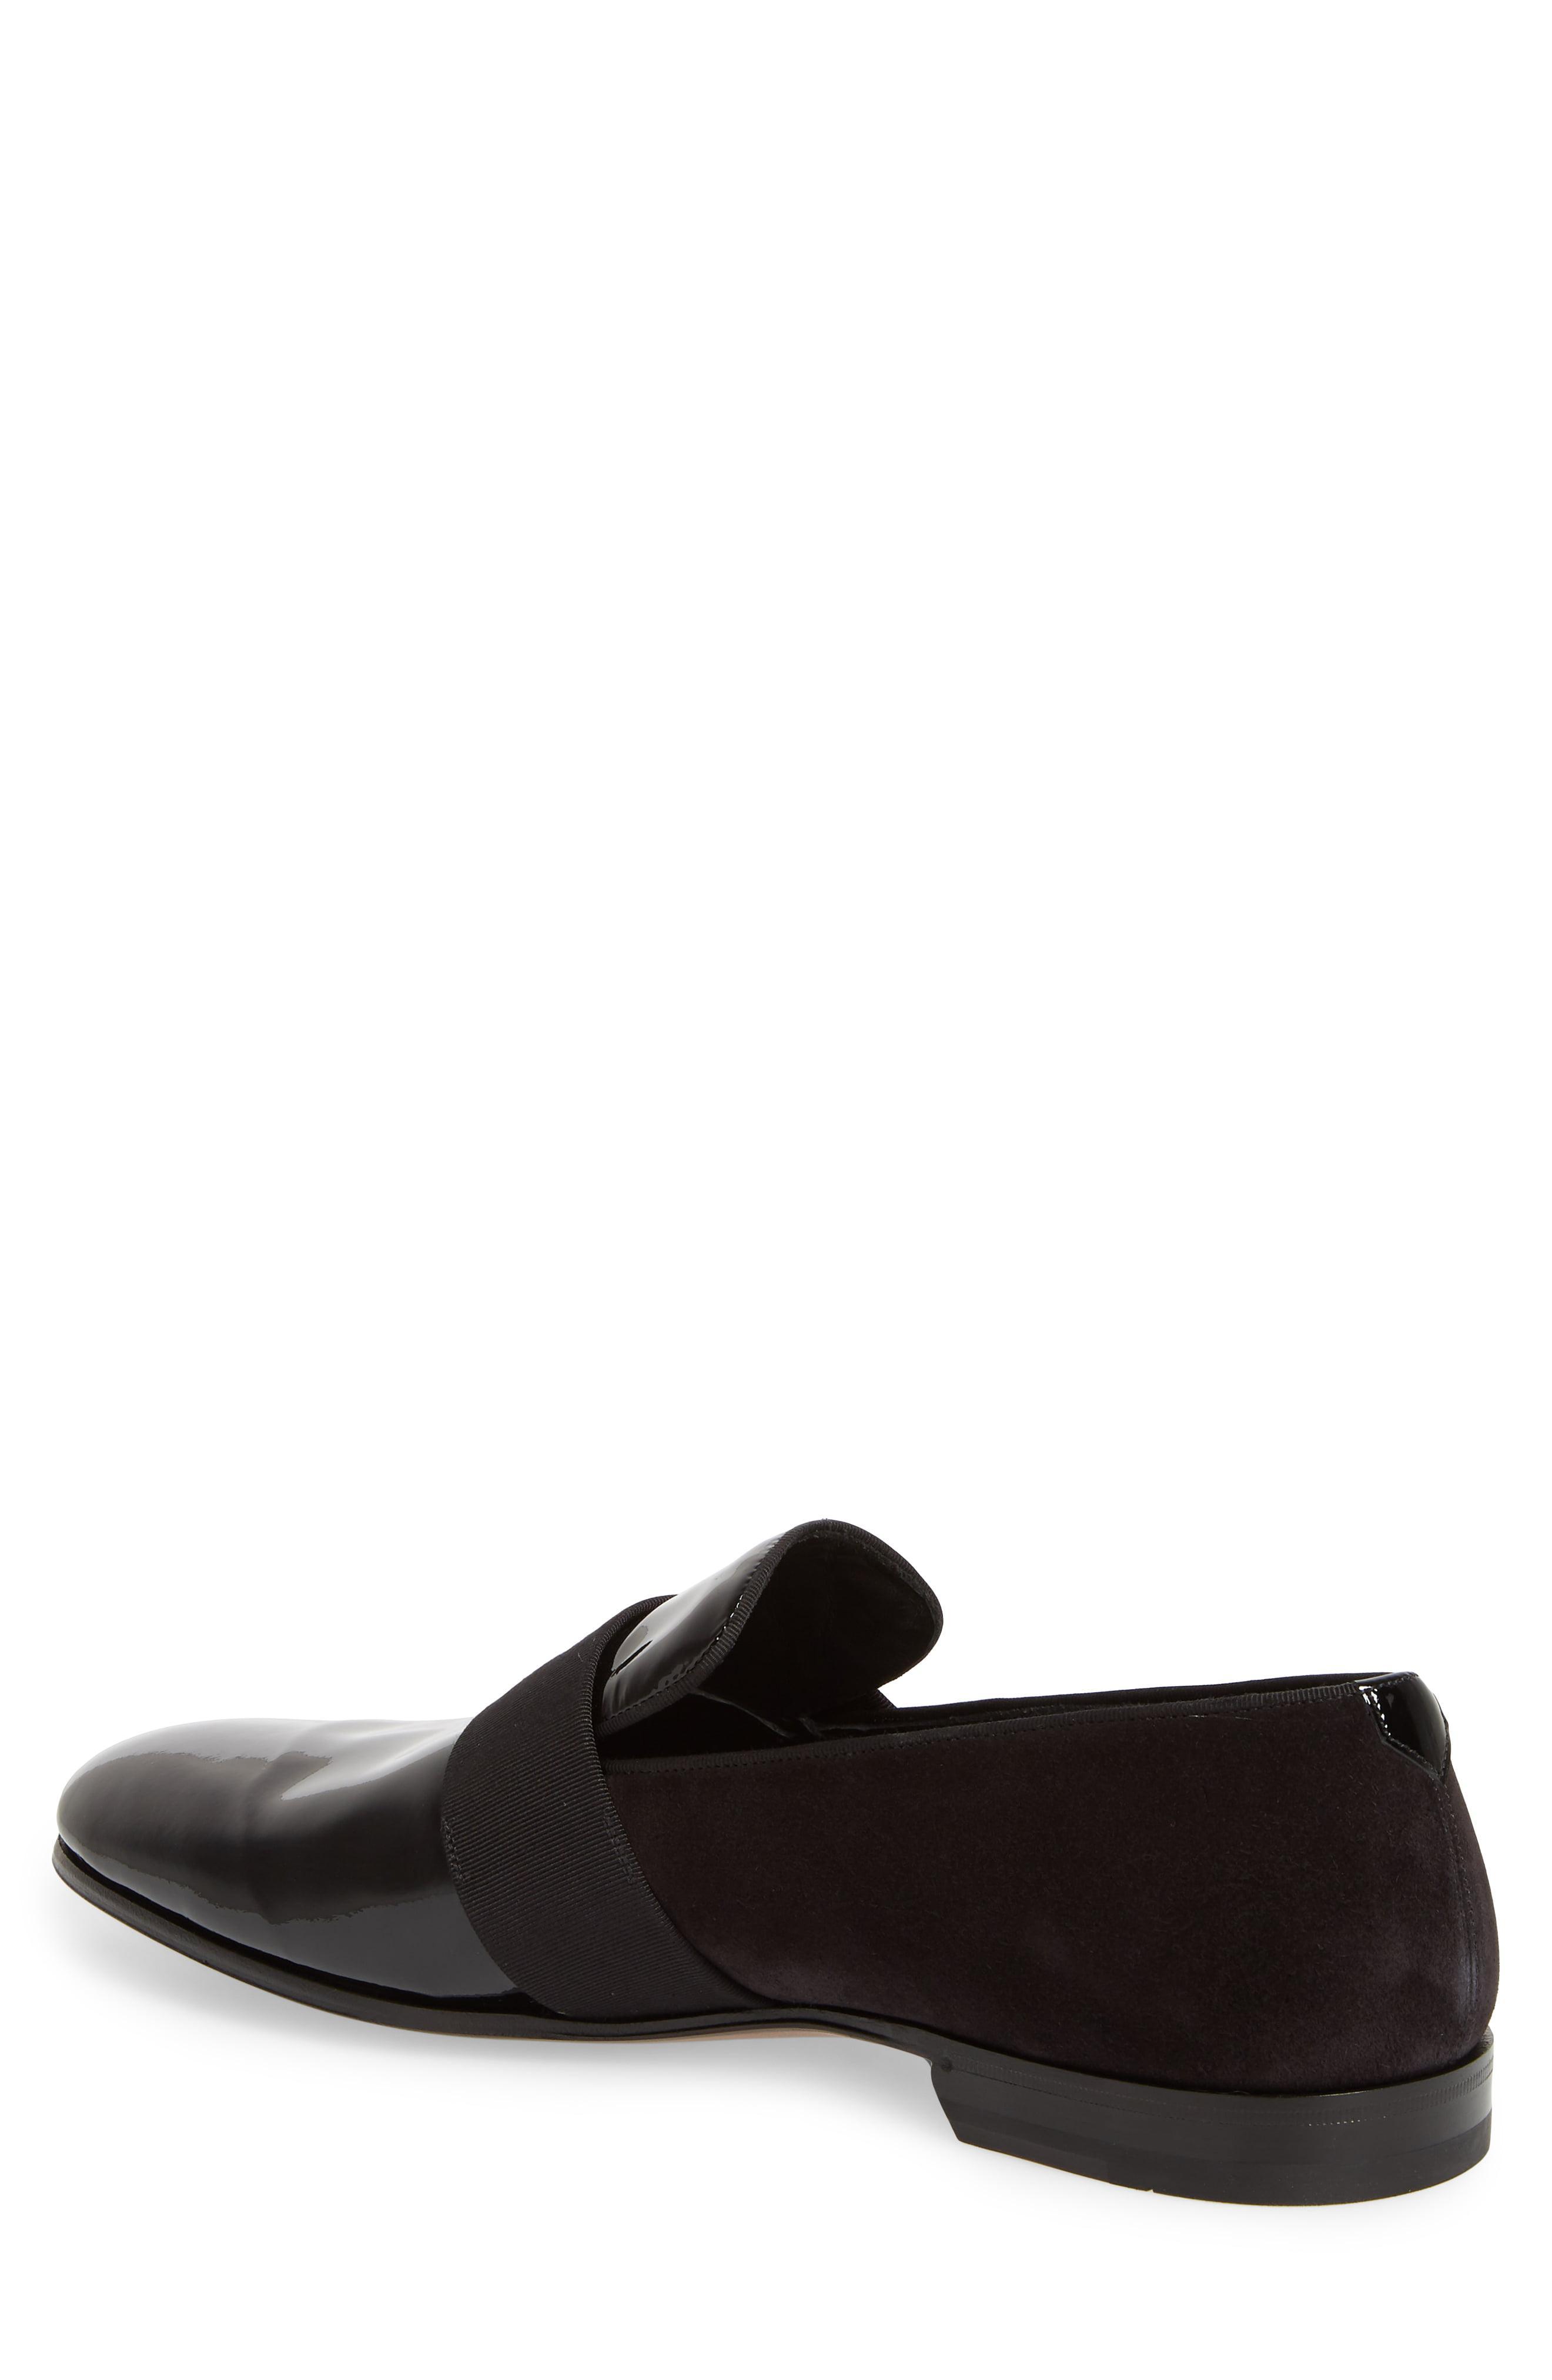 ef416427ae0d Ferragamo - Black Bryden Banded Loafer for Men - Lyst. View fullscreen